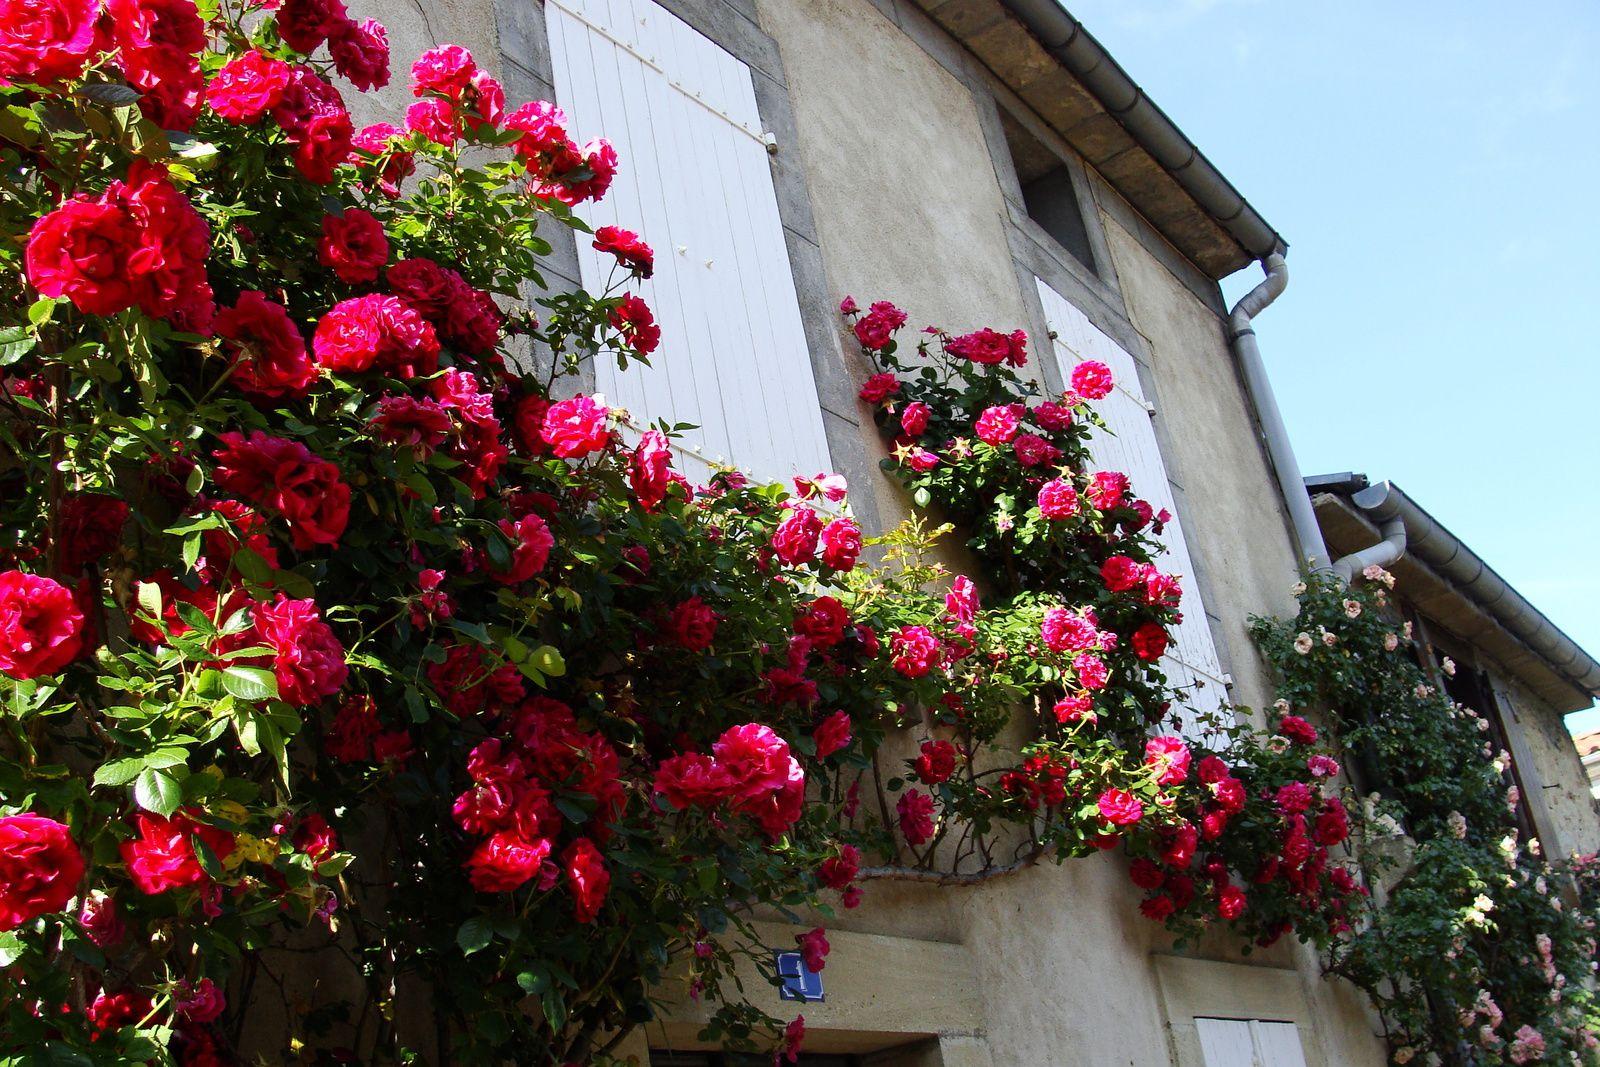 Camon: roses